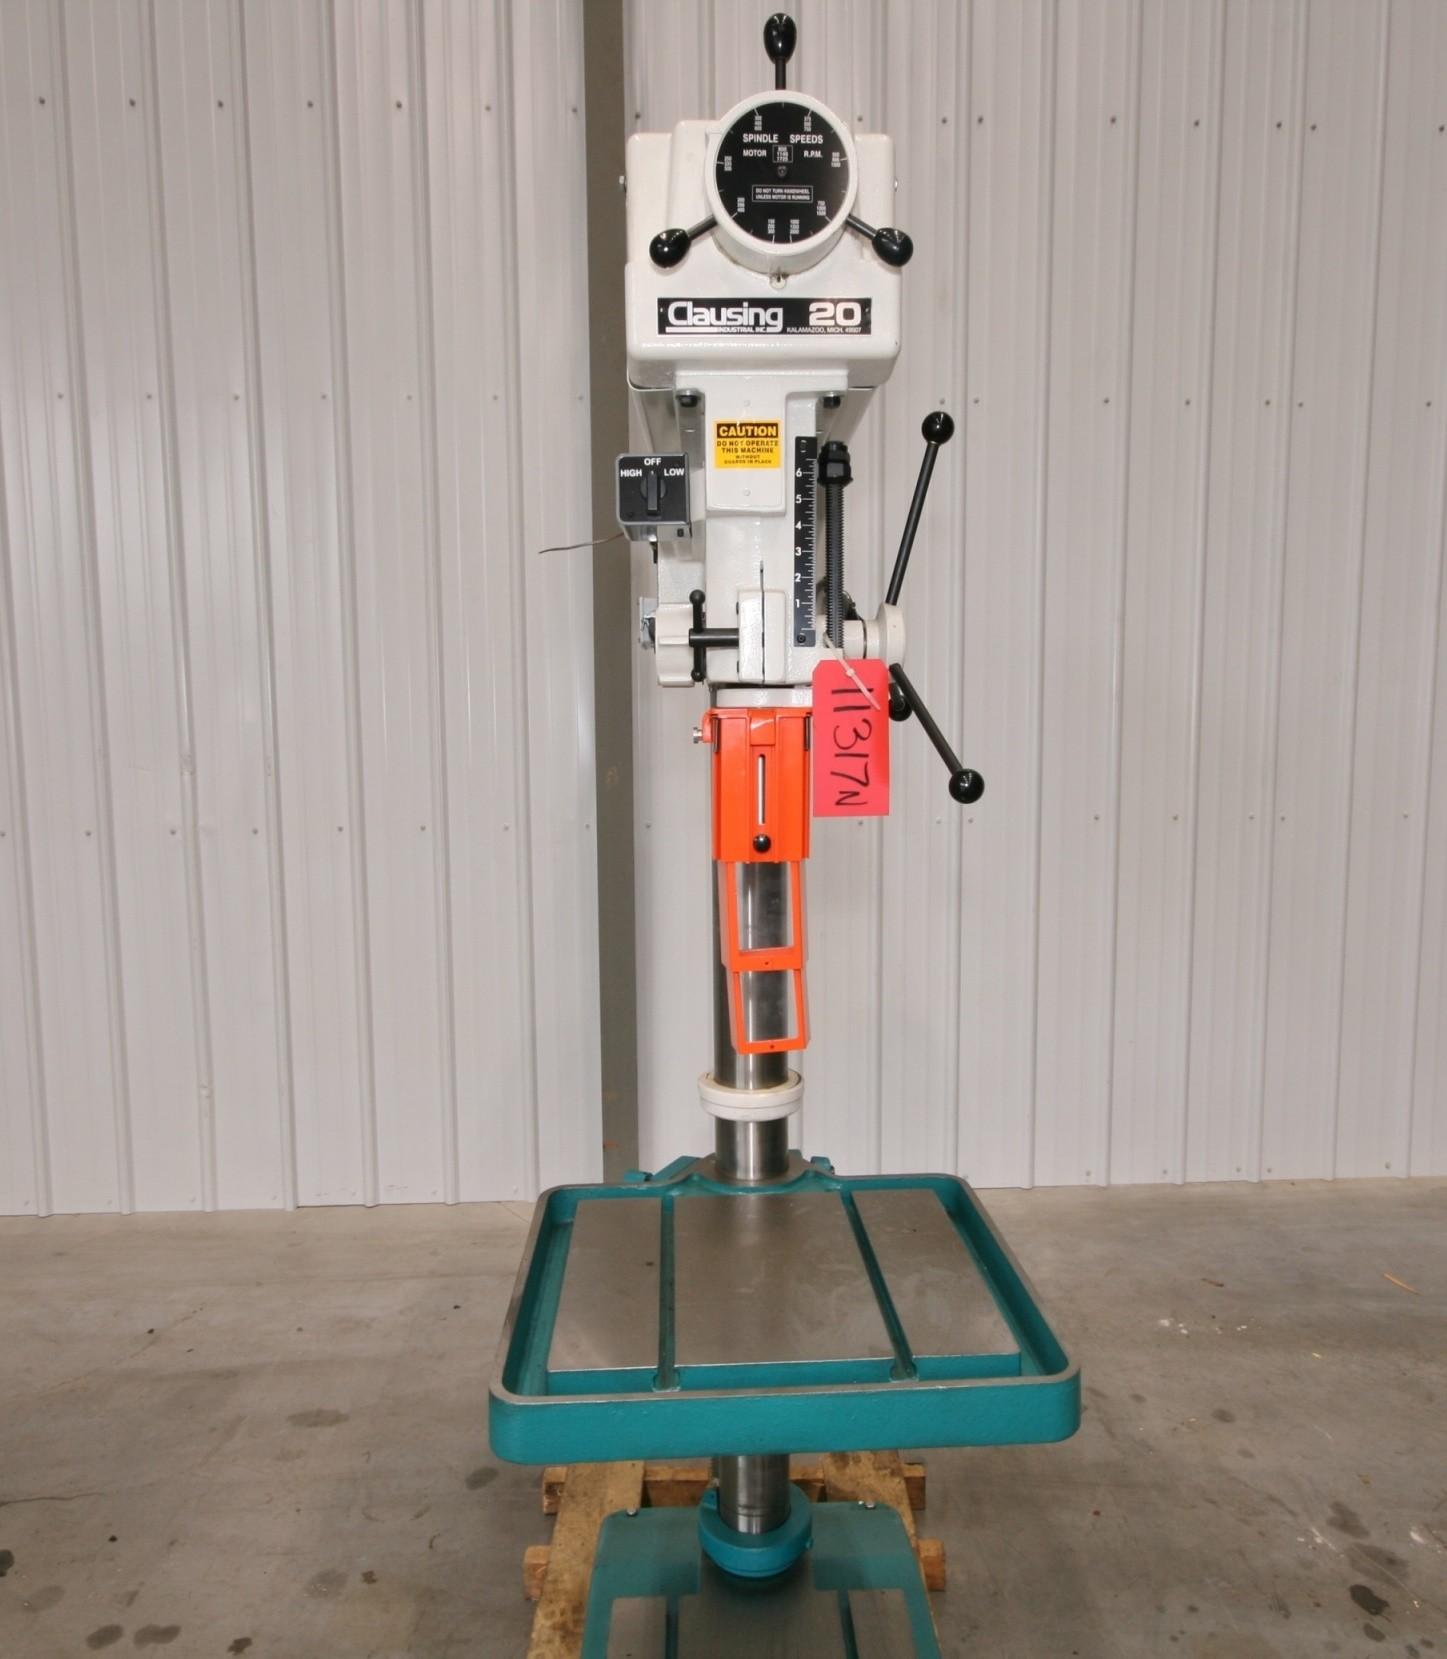 "Clausing 20"" Drill Press, Model 2276 - NEW"